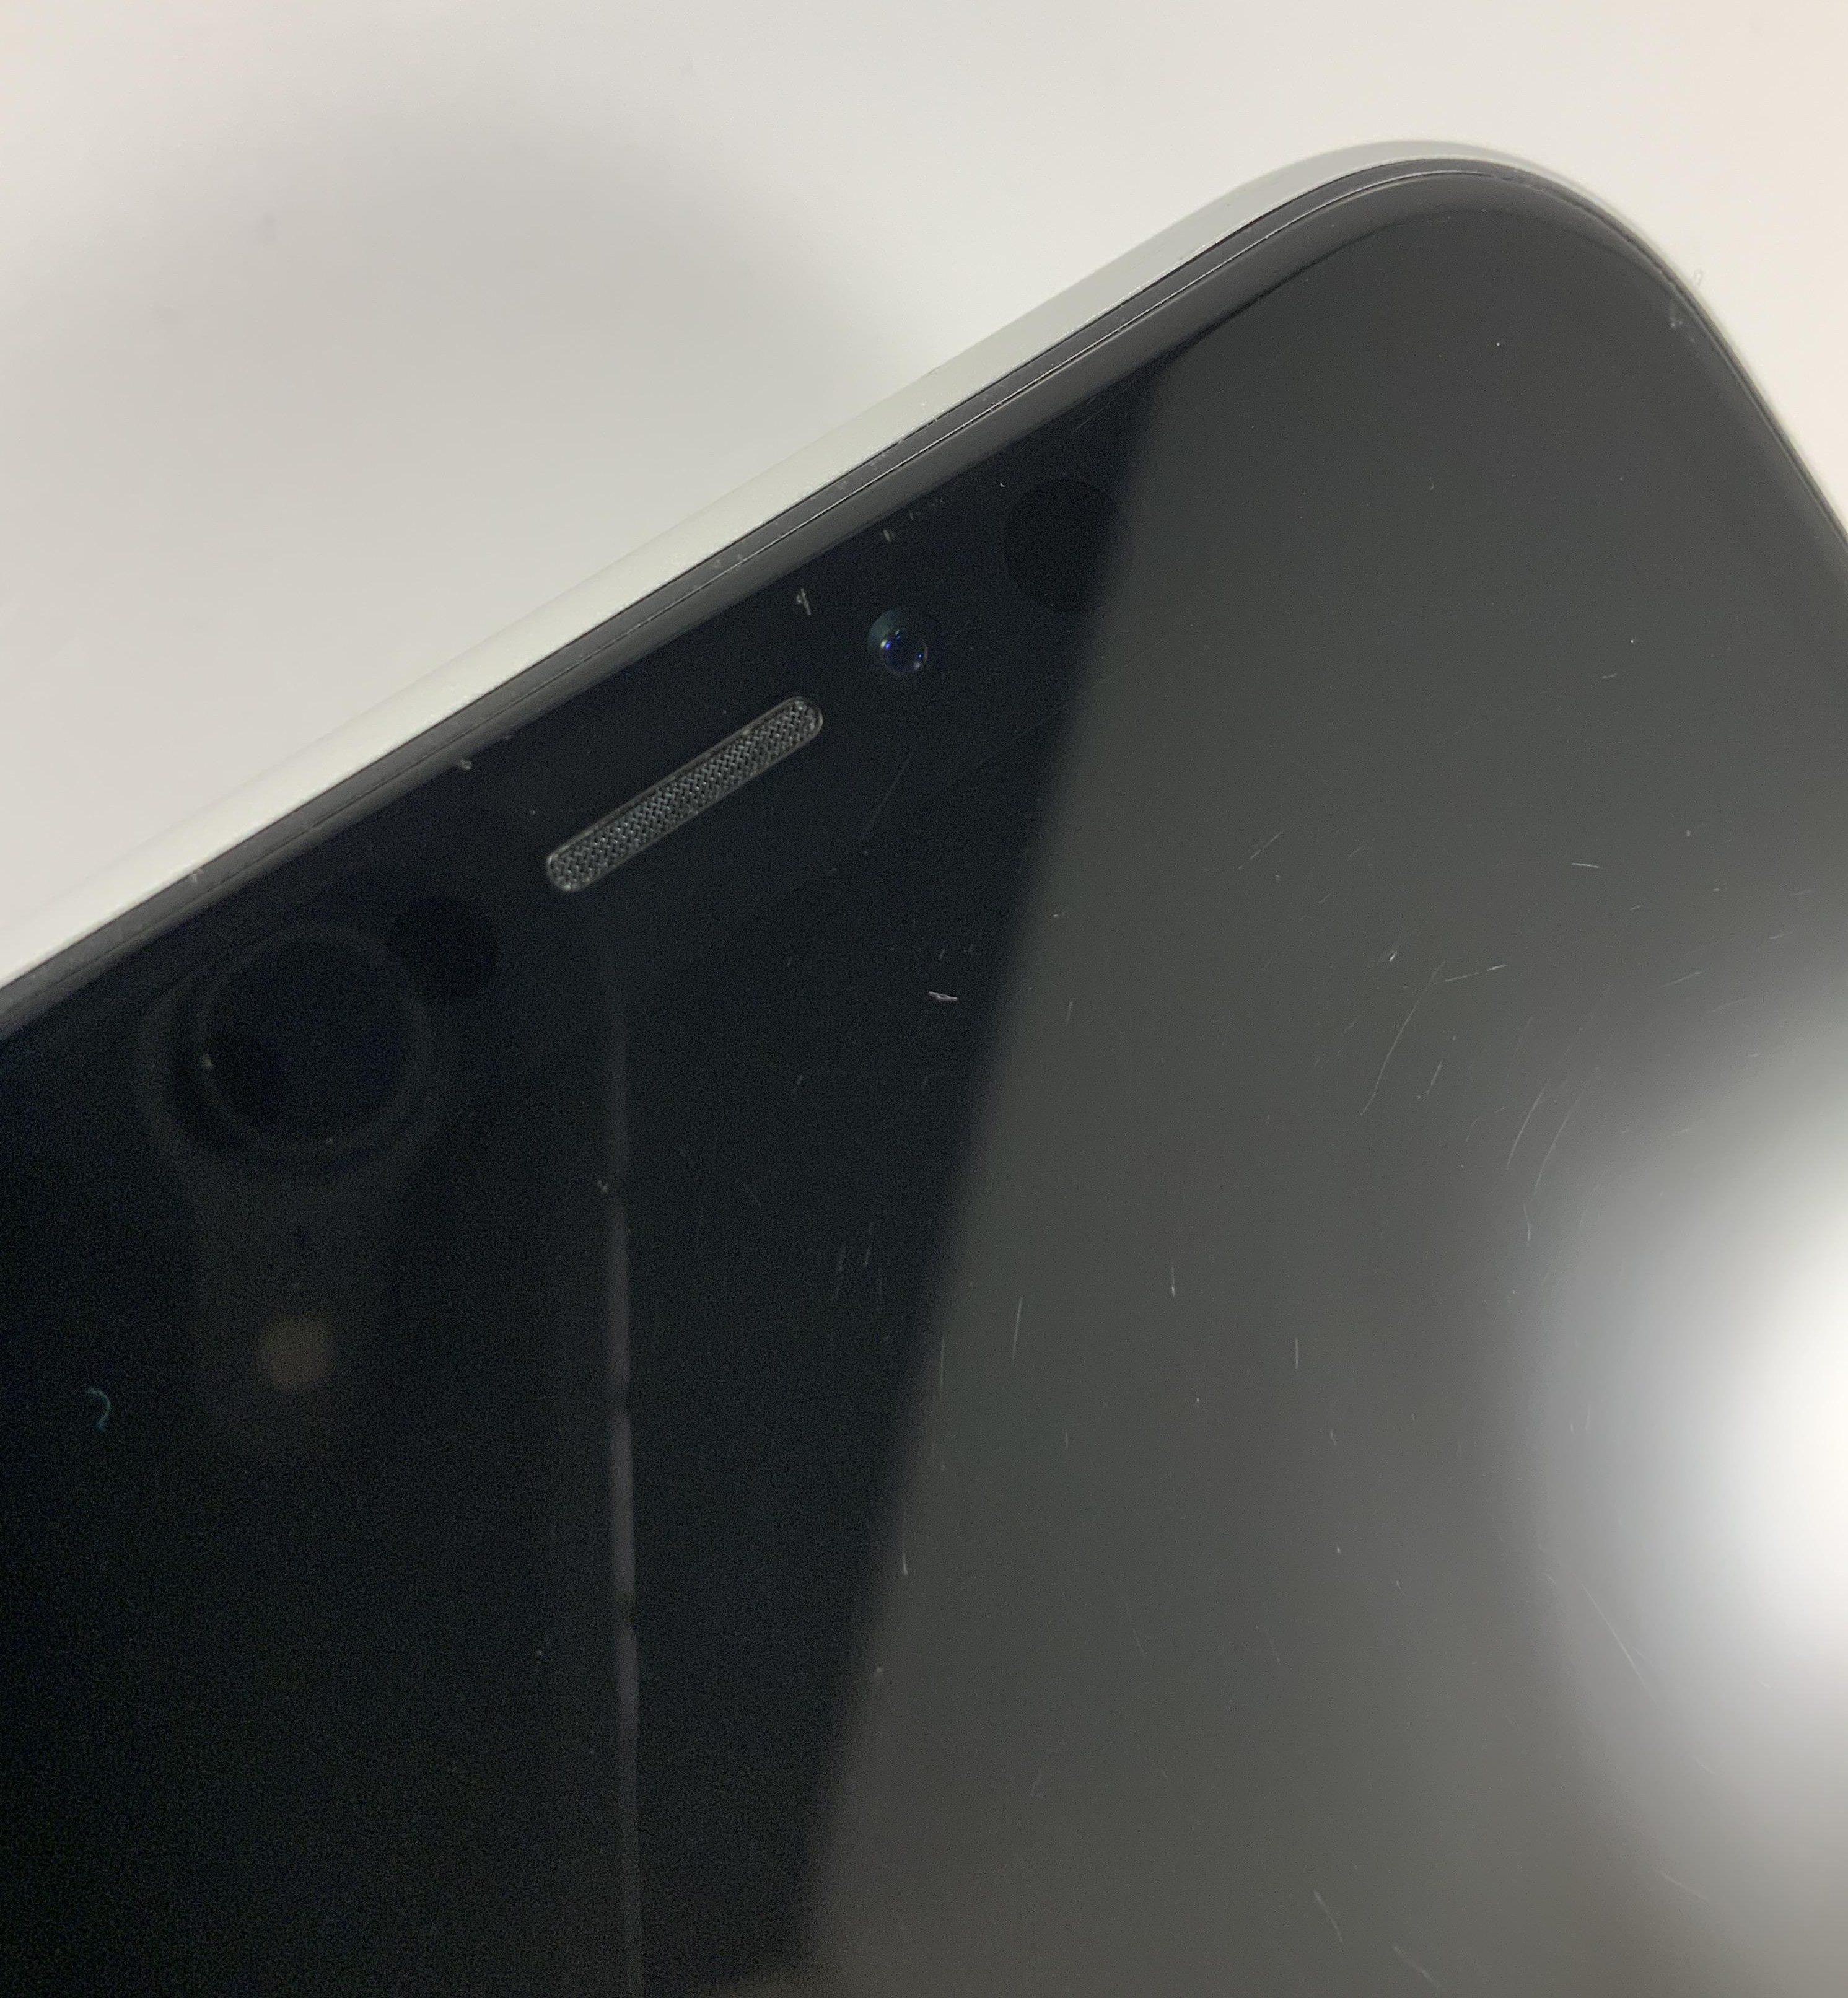 iPhone XR 128GB, 128GB, White, Afbeelding 4